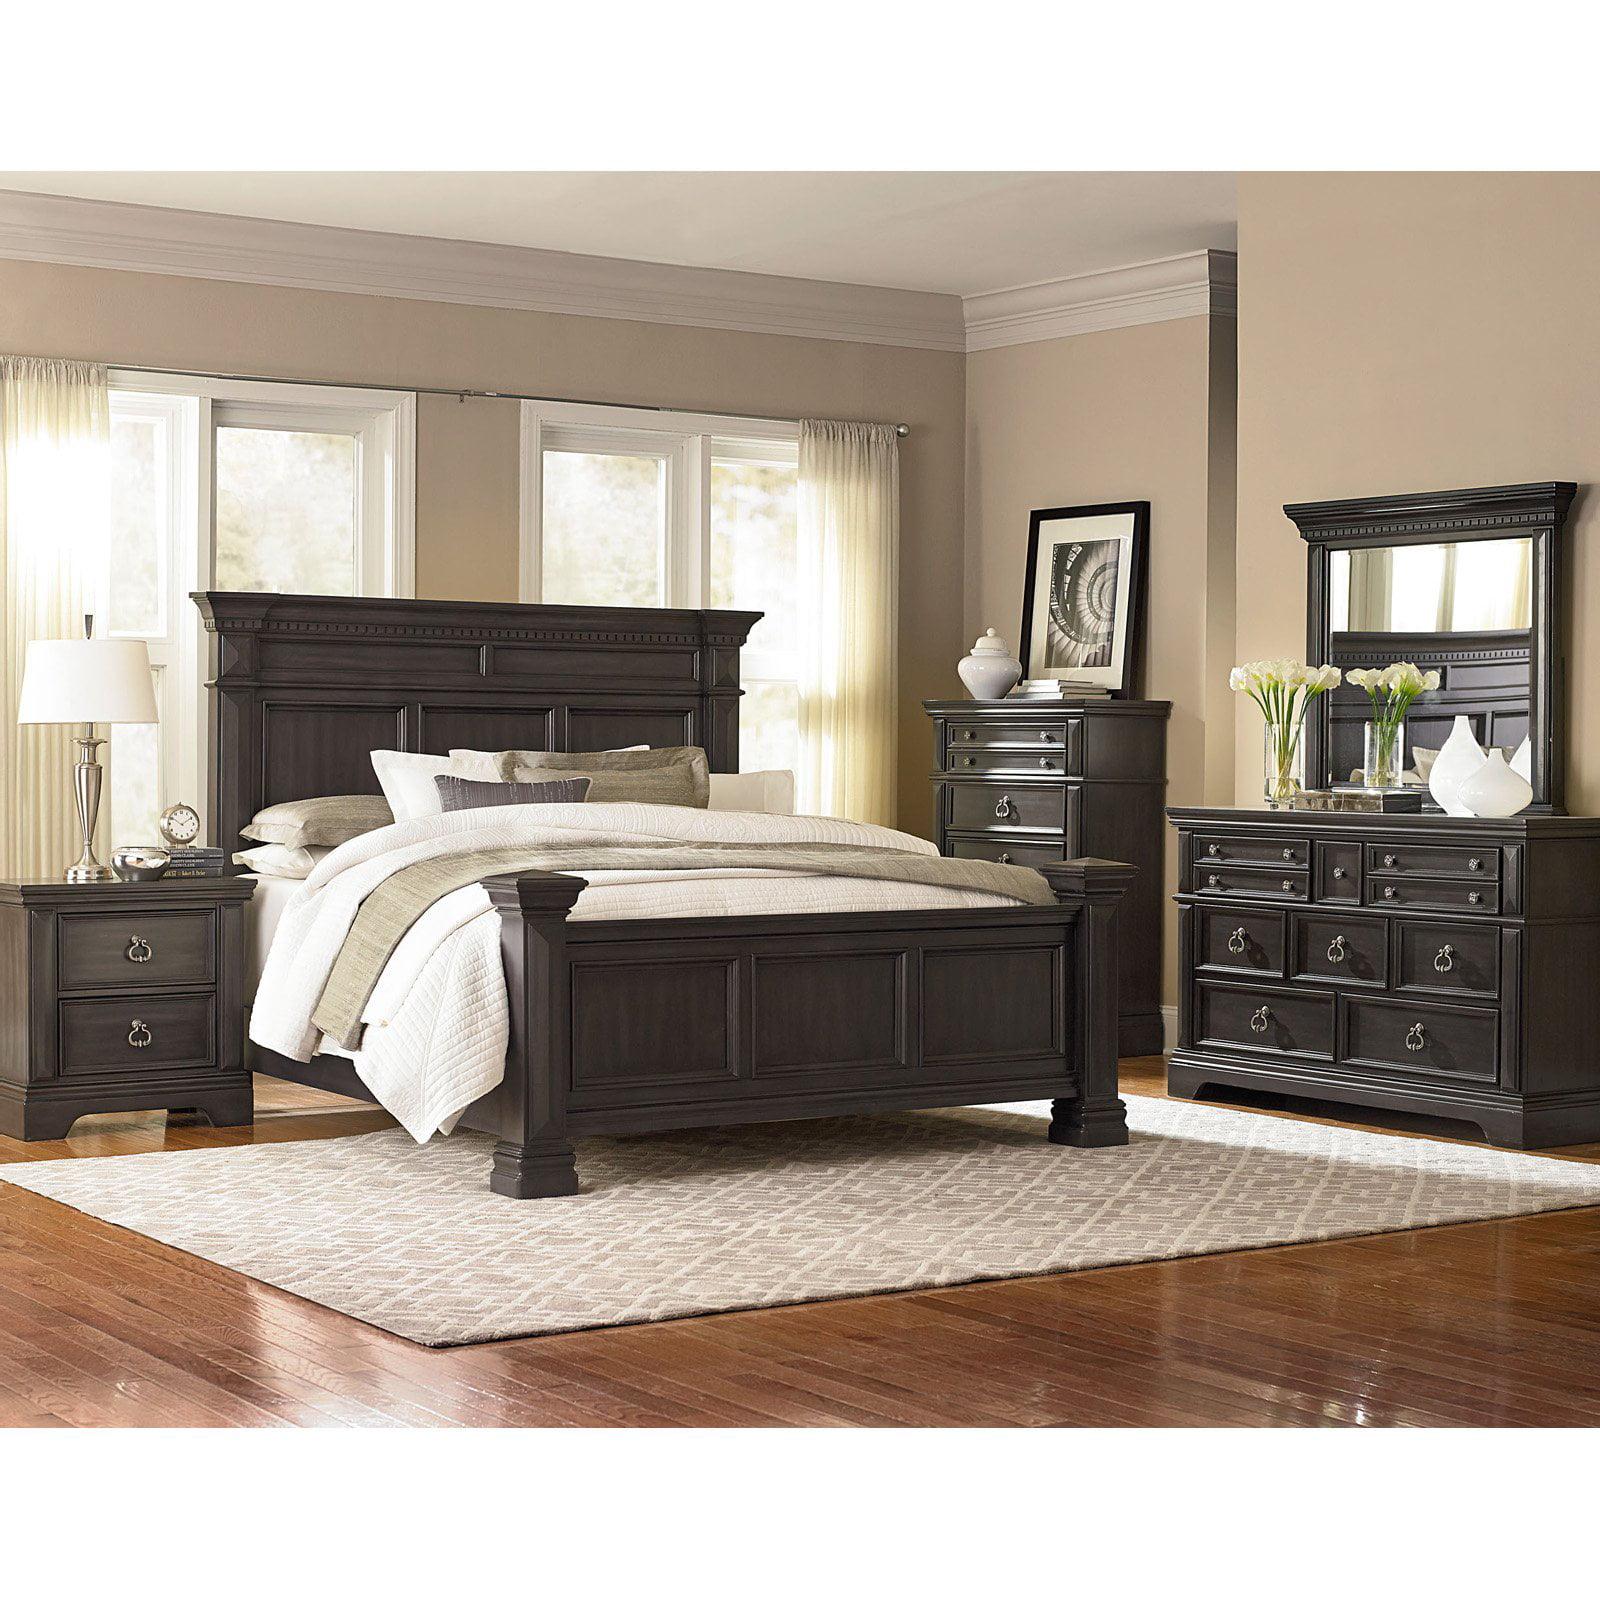 Standard Furniture Garrison Queen Panel Bed